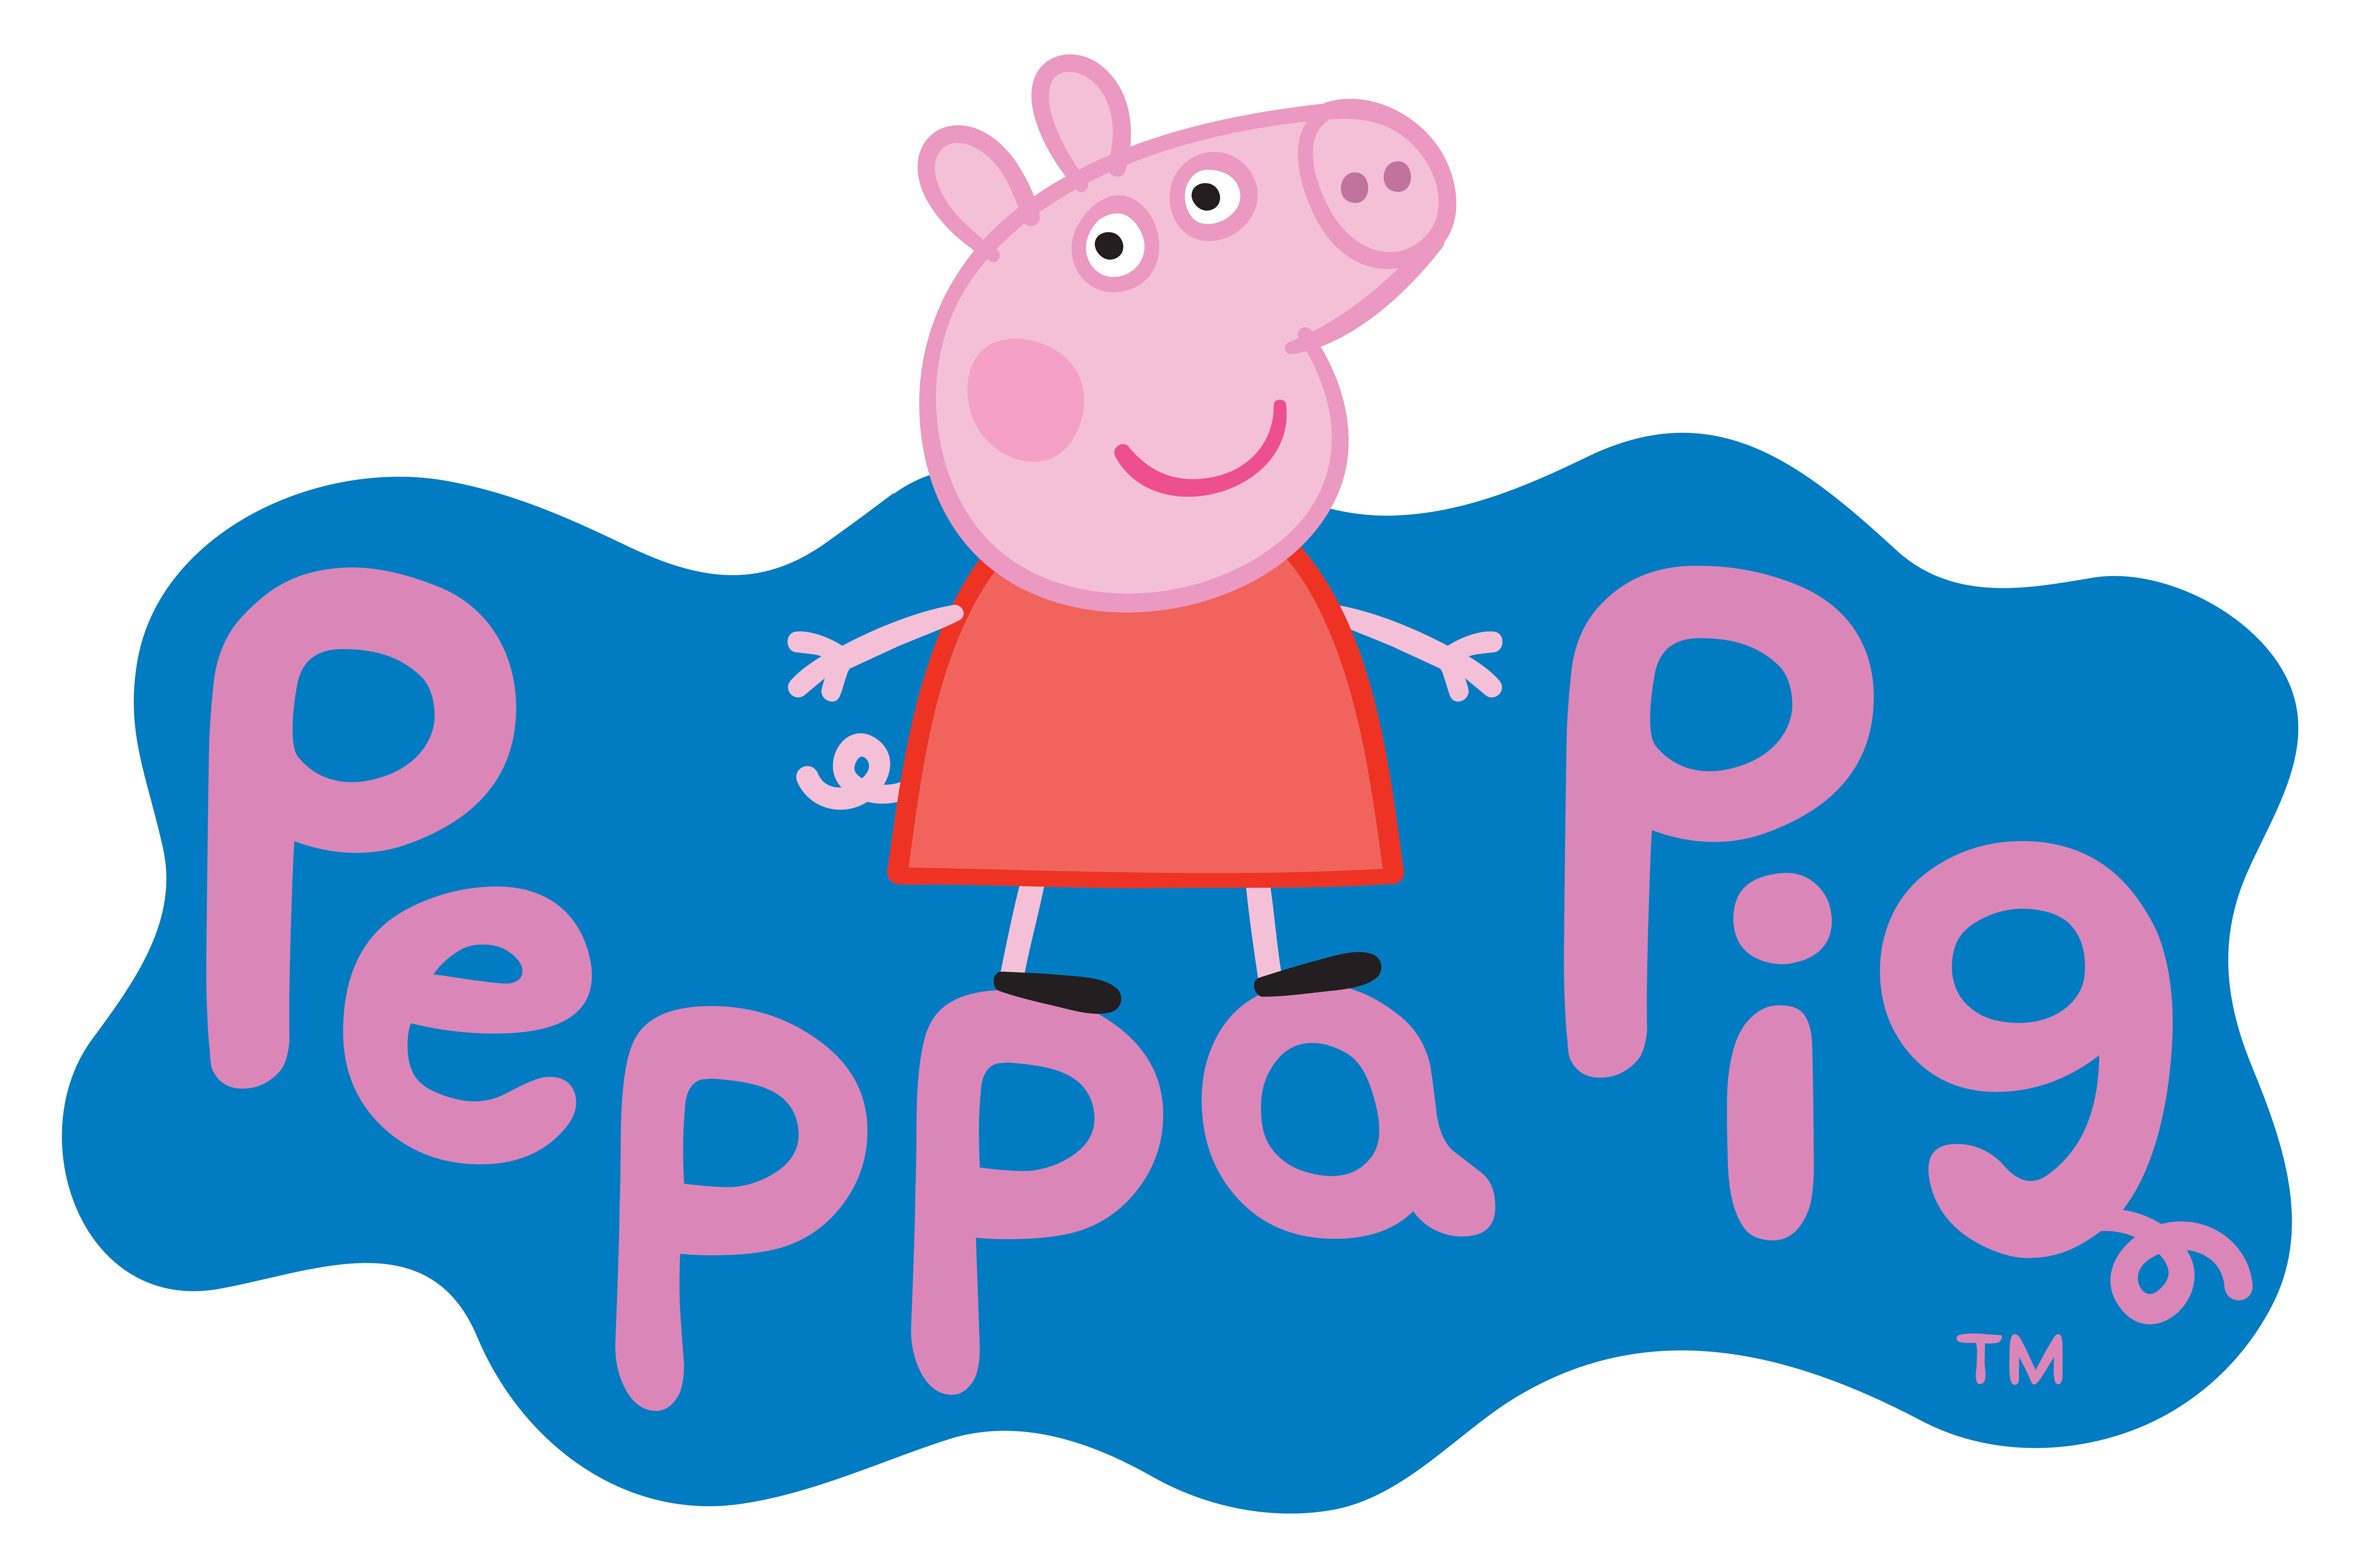 Peppa Pig Logo Transparent PNG Clip Art Image Gabi